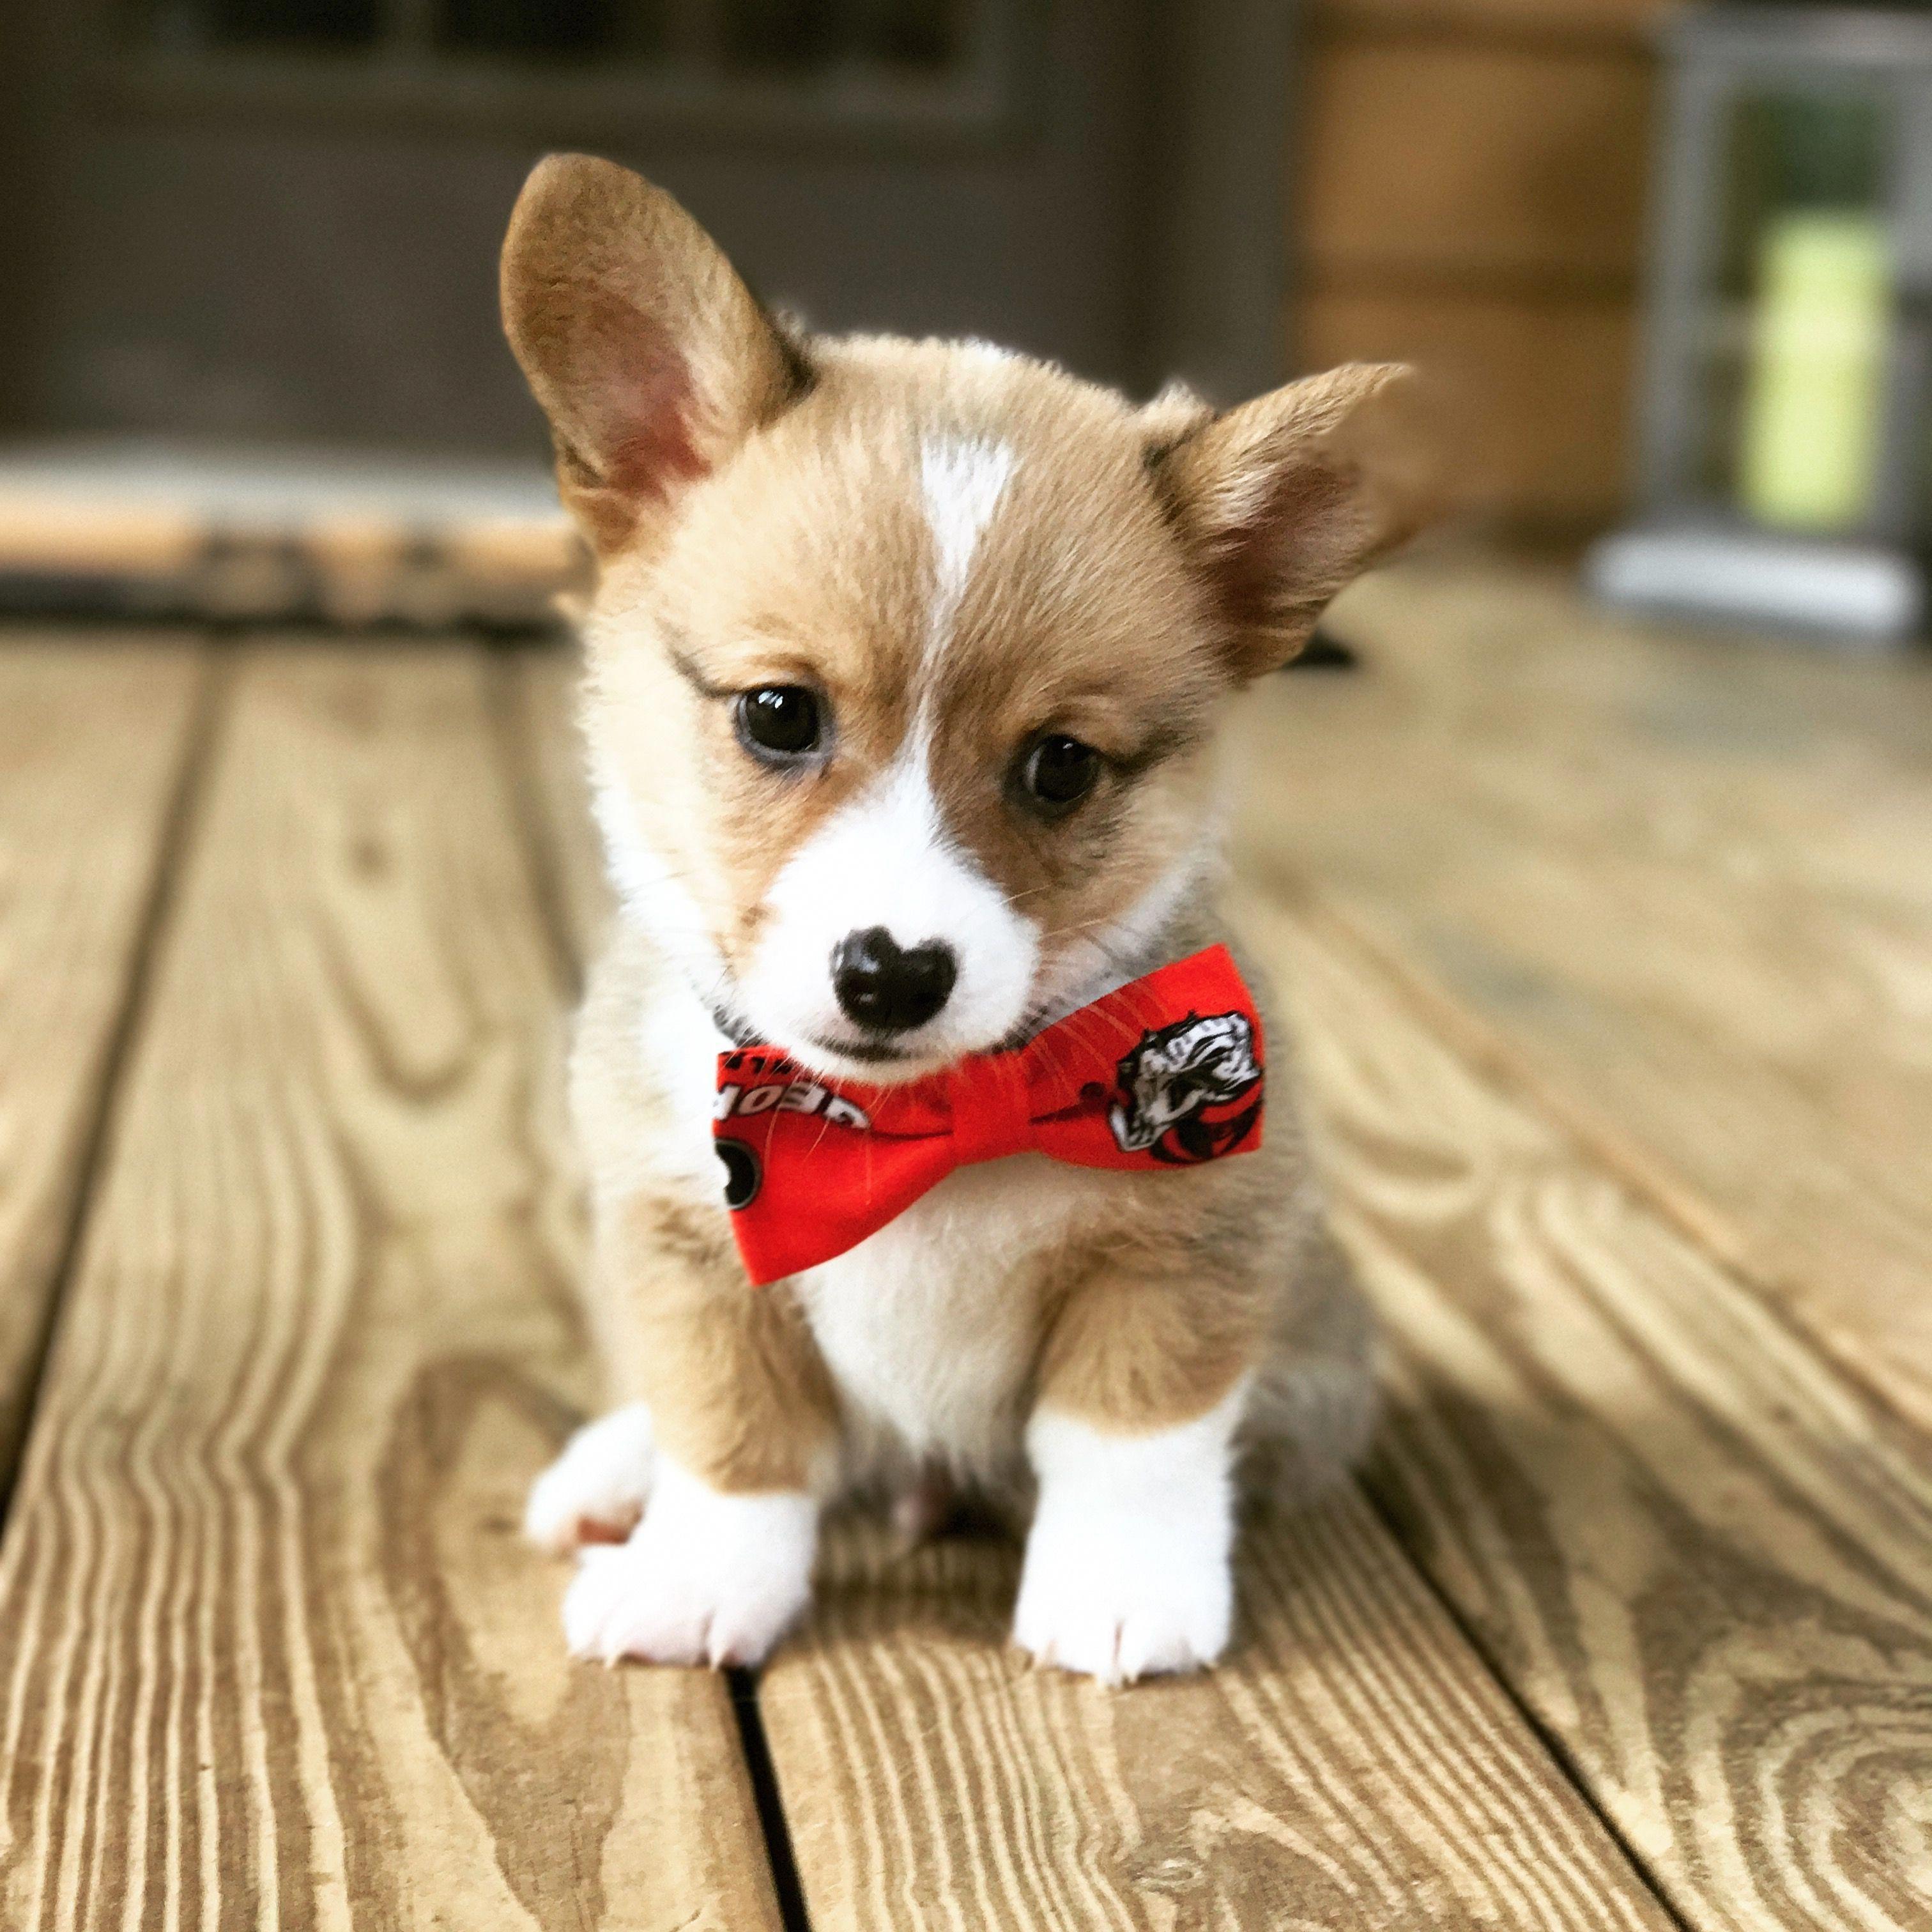 Baby corgi #DogTattooYorkshire | Baby corgi, Corgi dog breed, Corgi